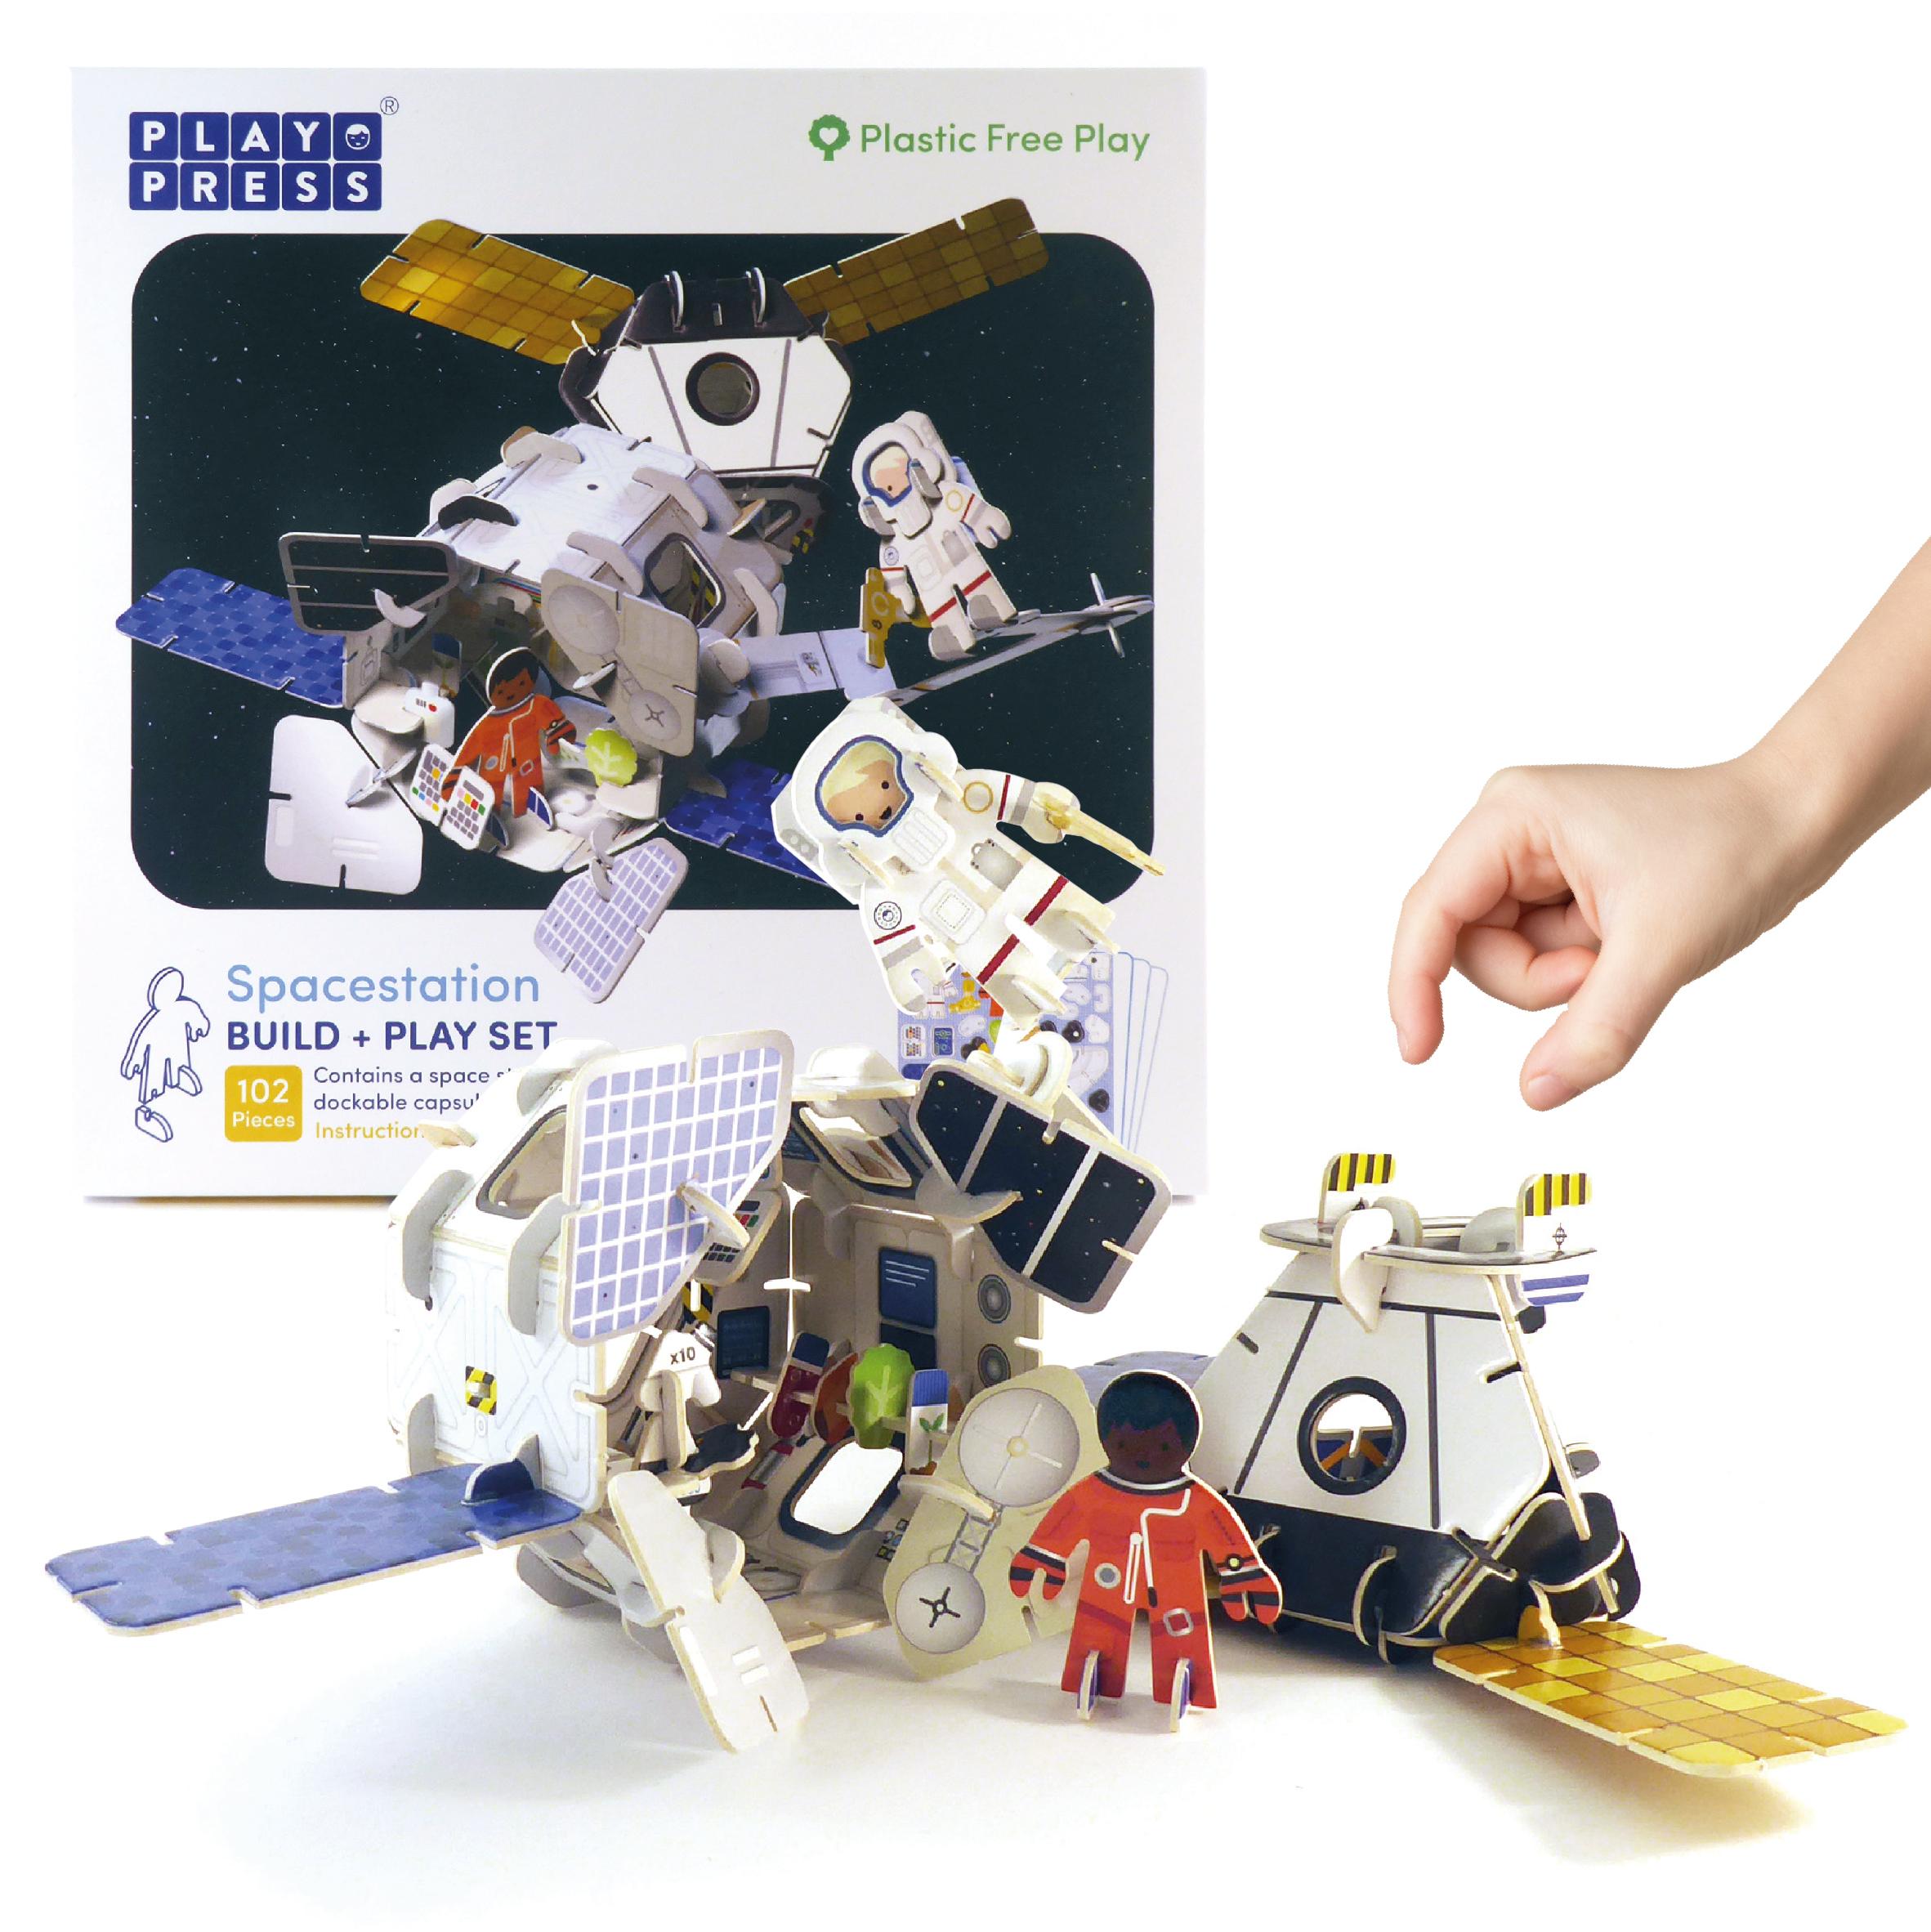 Play Press - Spacestation Playset